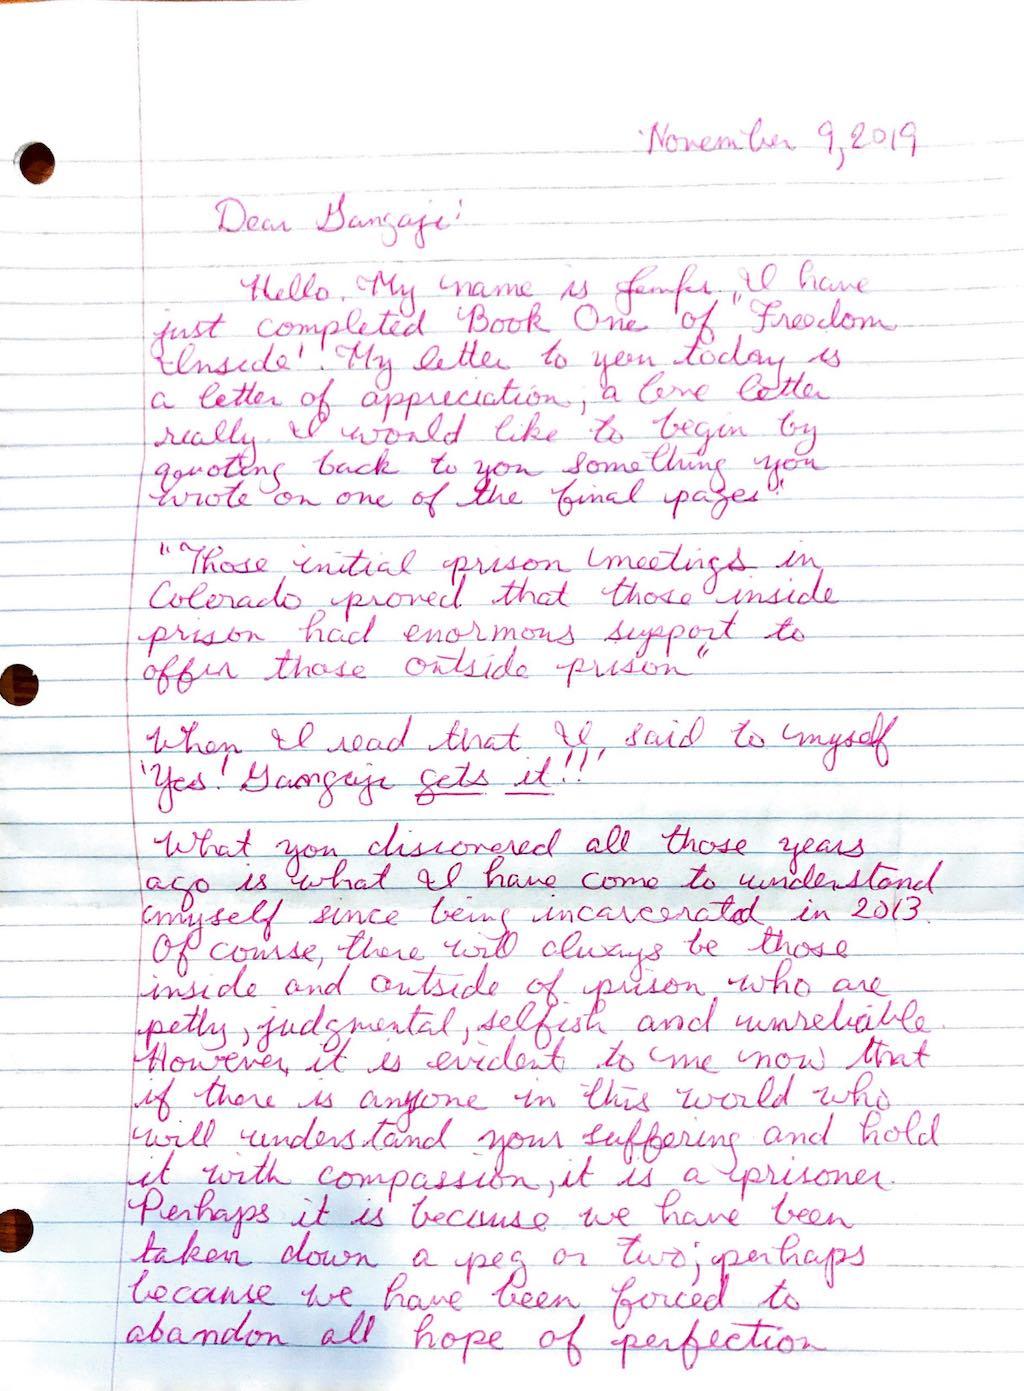 Jennifer_letter-1_Page_1